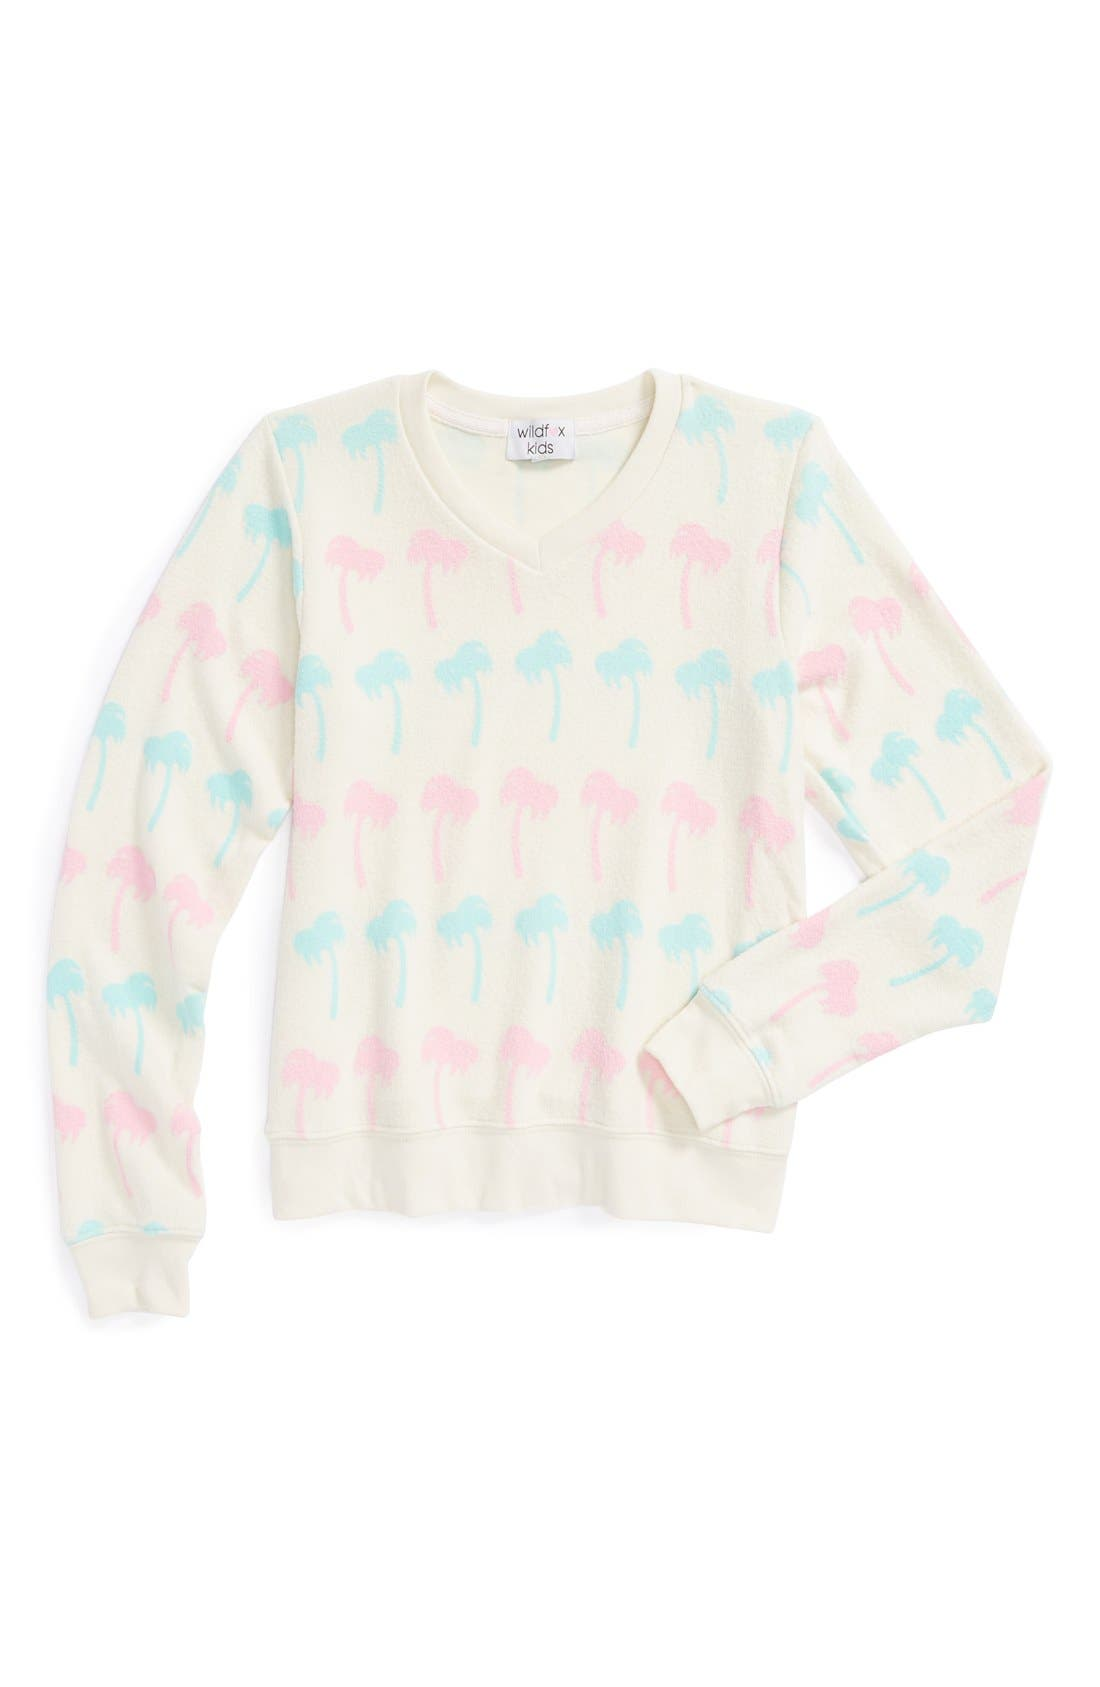 Alternate Image 1 Selected - Wildfox 'Pastel Palms' V-Neck Sweatshirt (Big Girls)